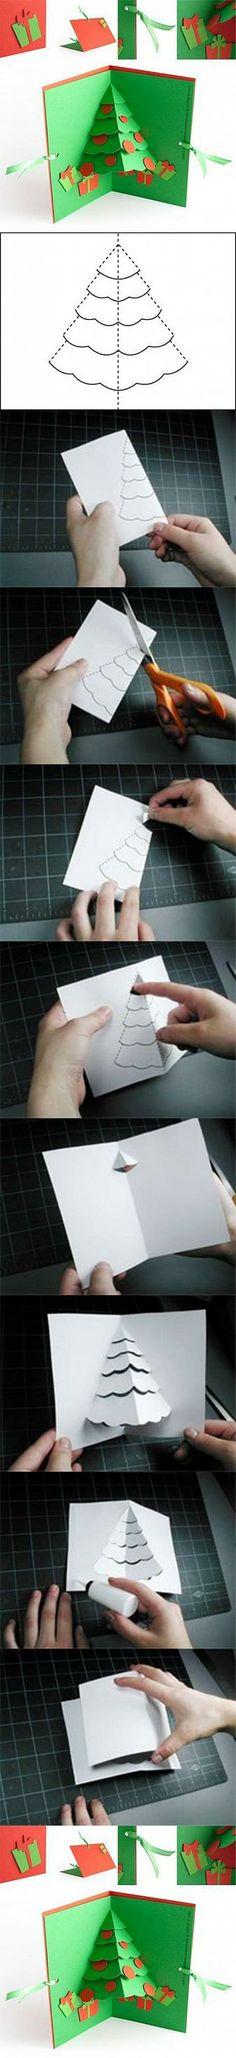 DIY Christmas Tree Pop Up Card DIY Projects | UsefulDIY.com